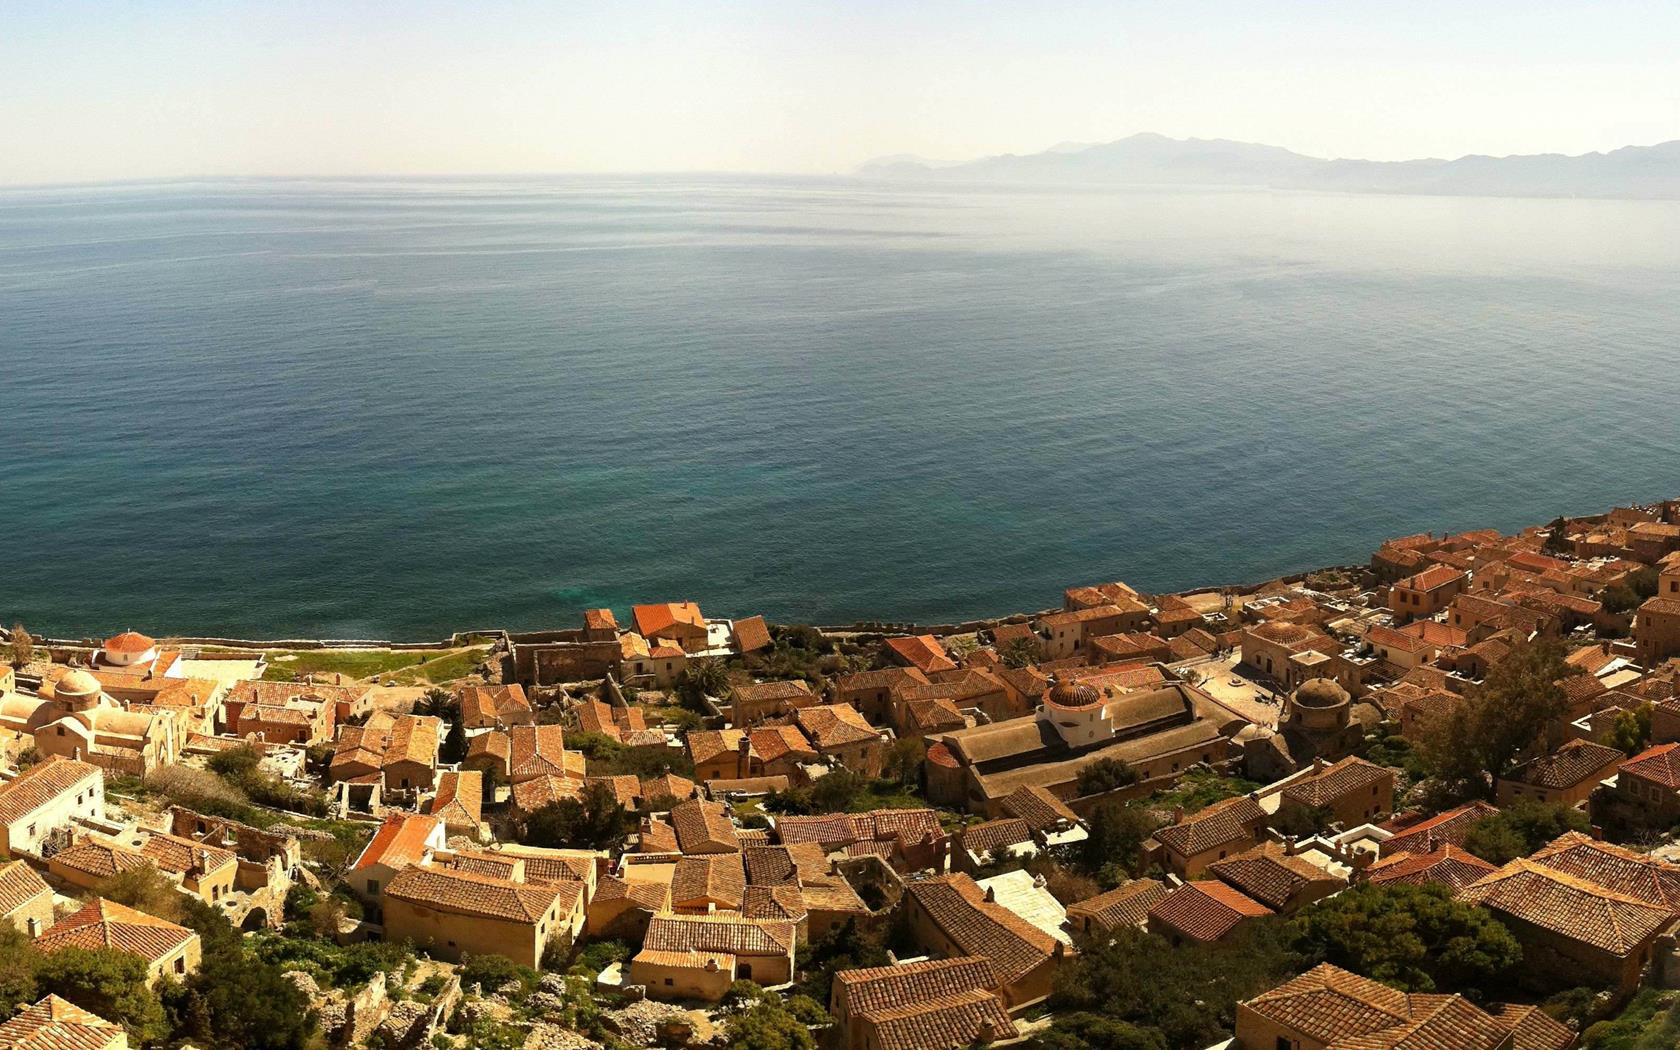 Luxury 5 Star Hotel Gythio Mani Greece Mareggio Luxury Suites 1680x1050